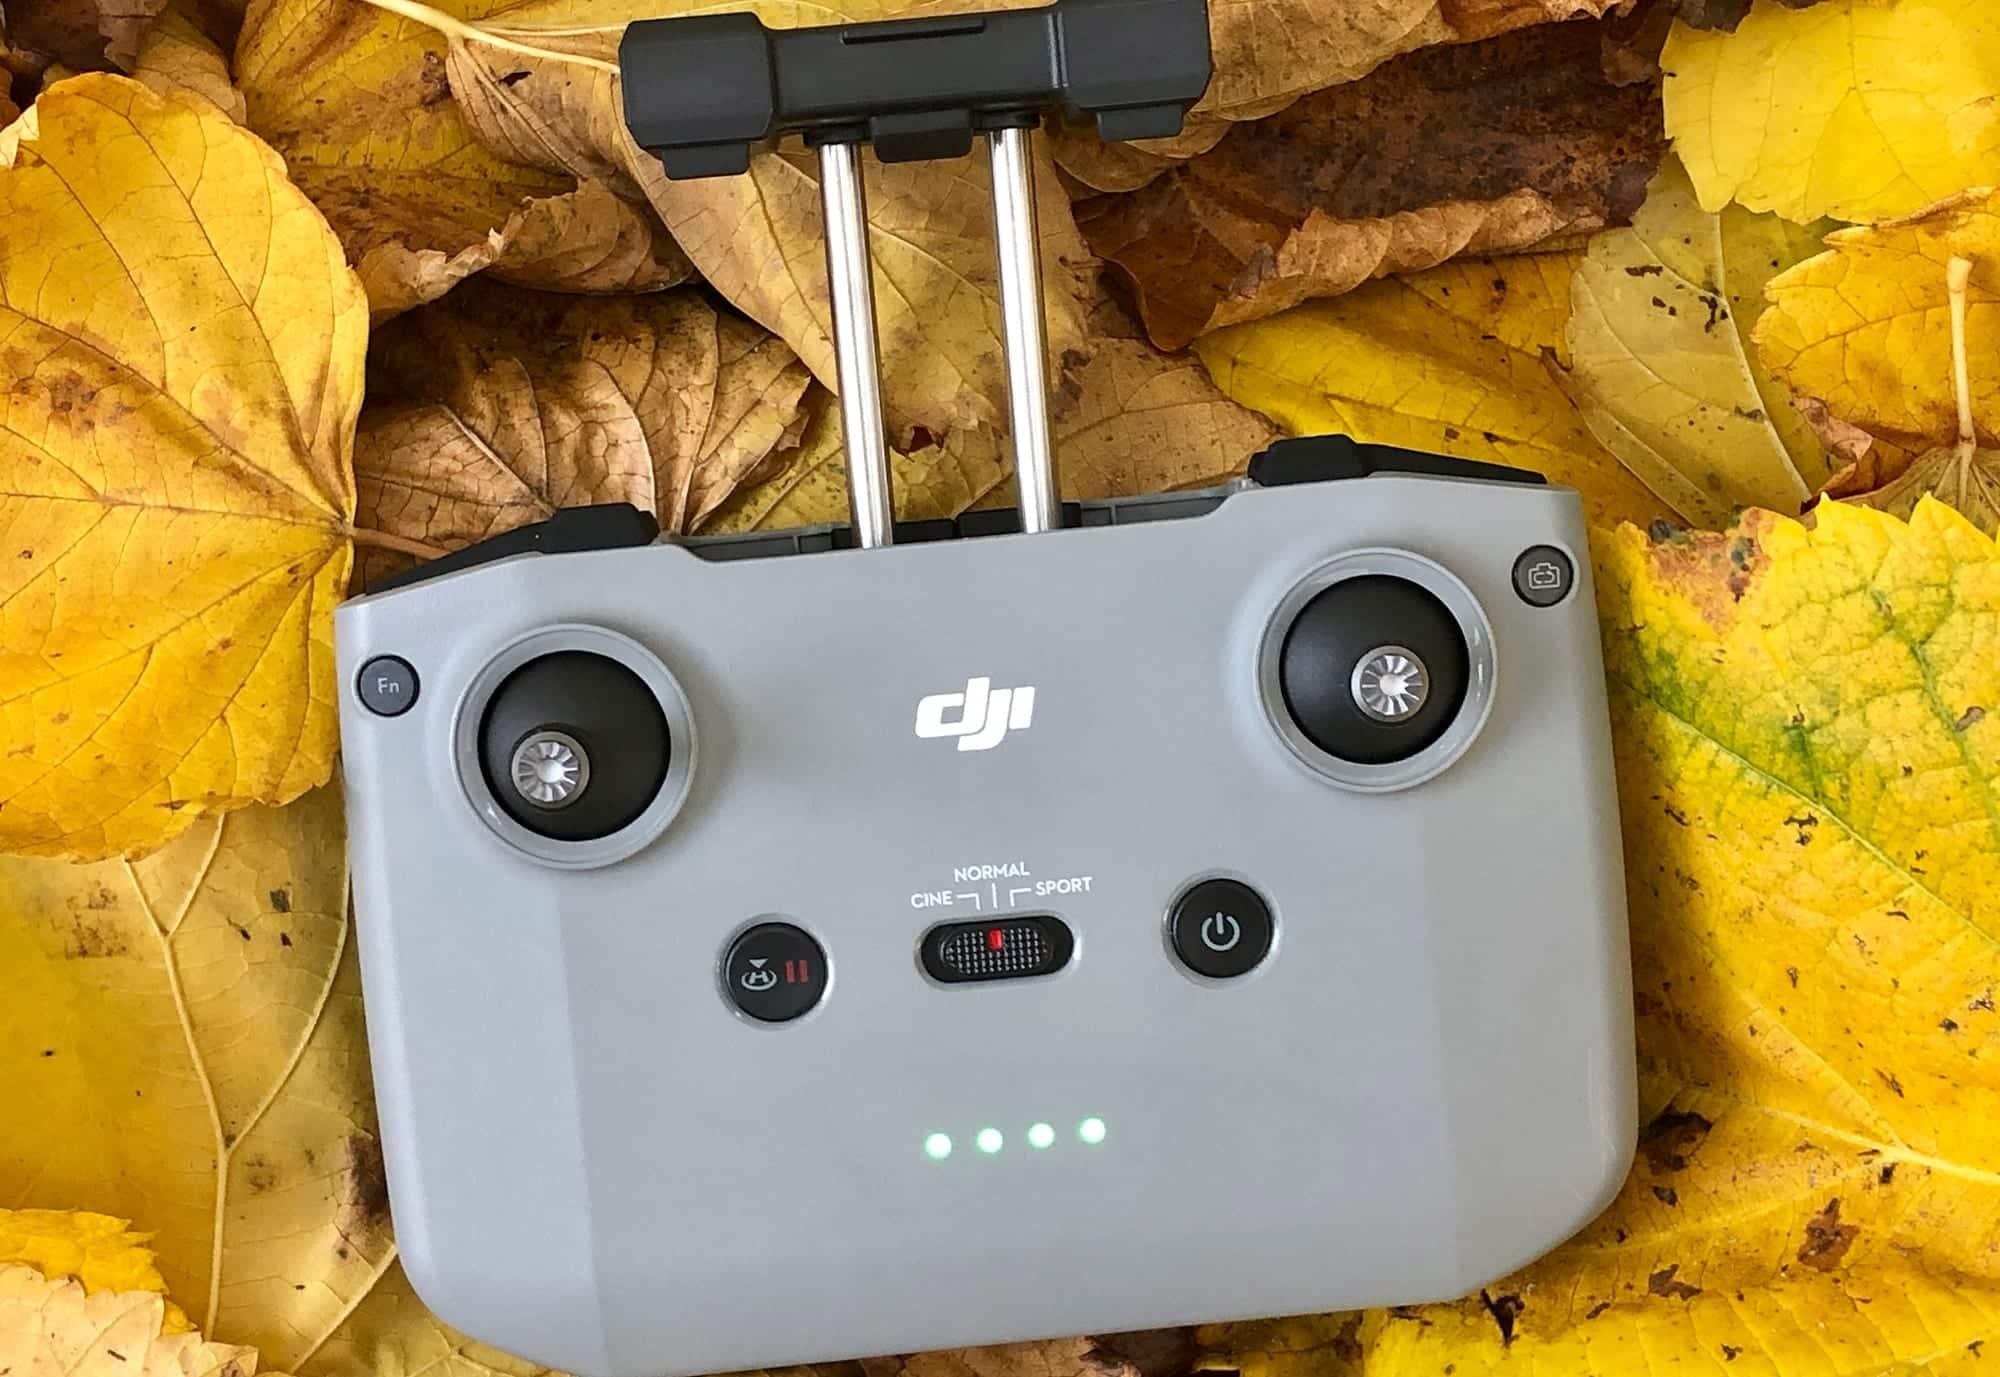 DJI Mini 2 review: less is more